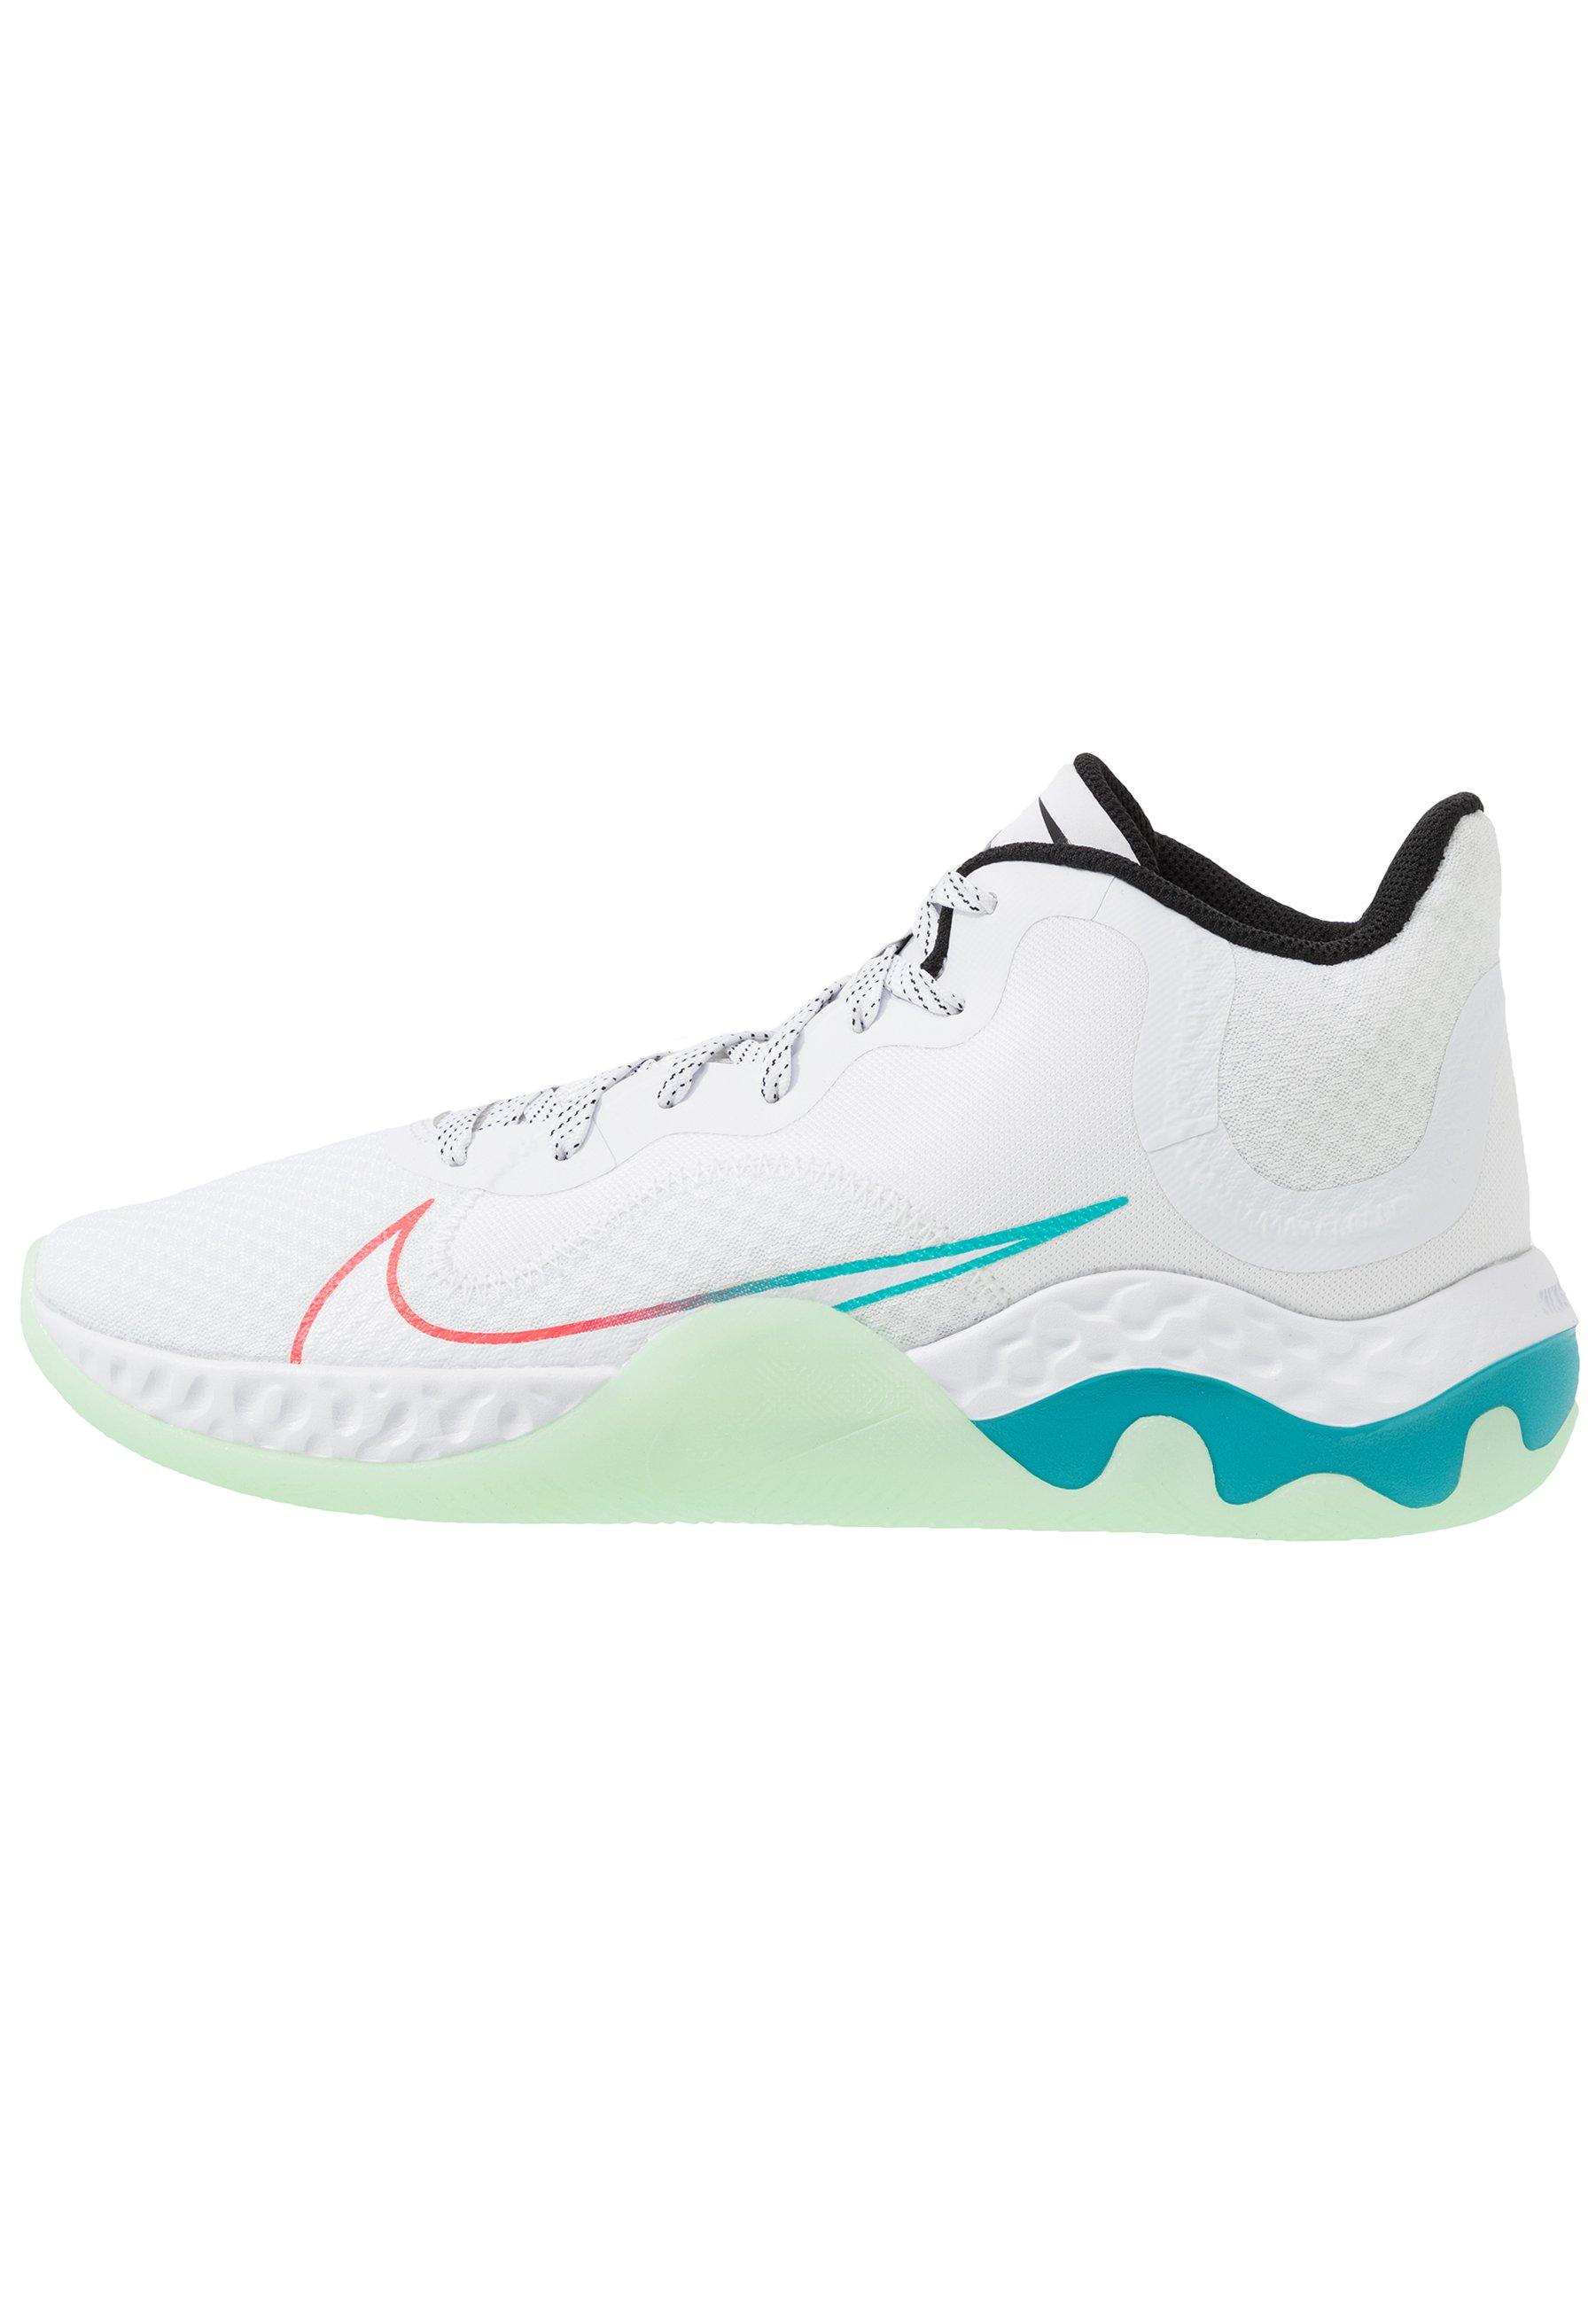 RENEW ELEVATE Chaussures de basket whiteblackflash crimsonoracle aquavapor green